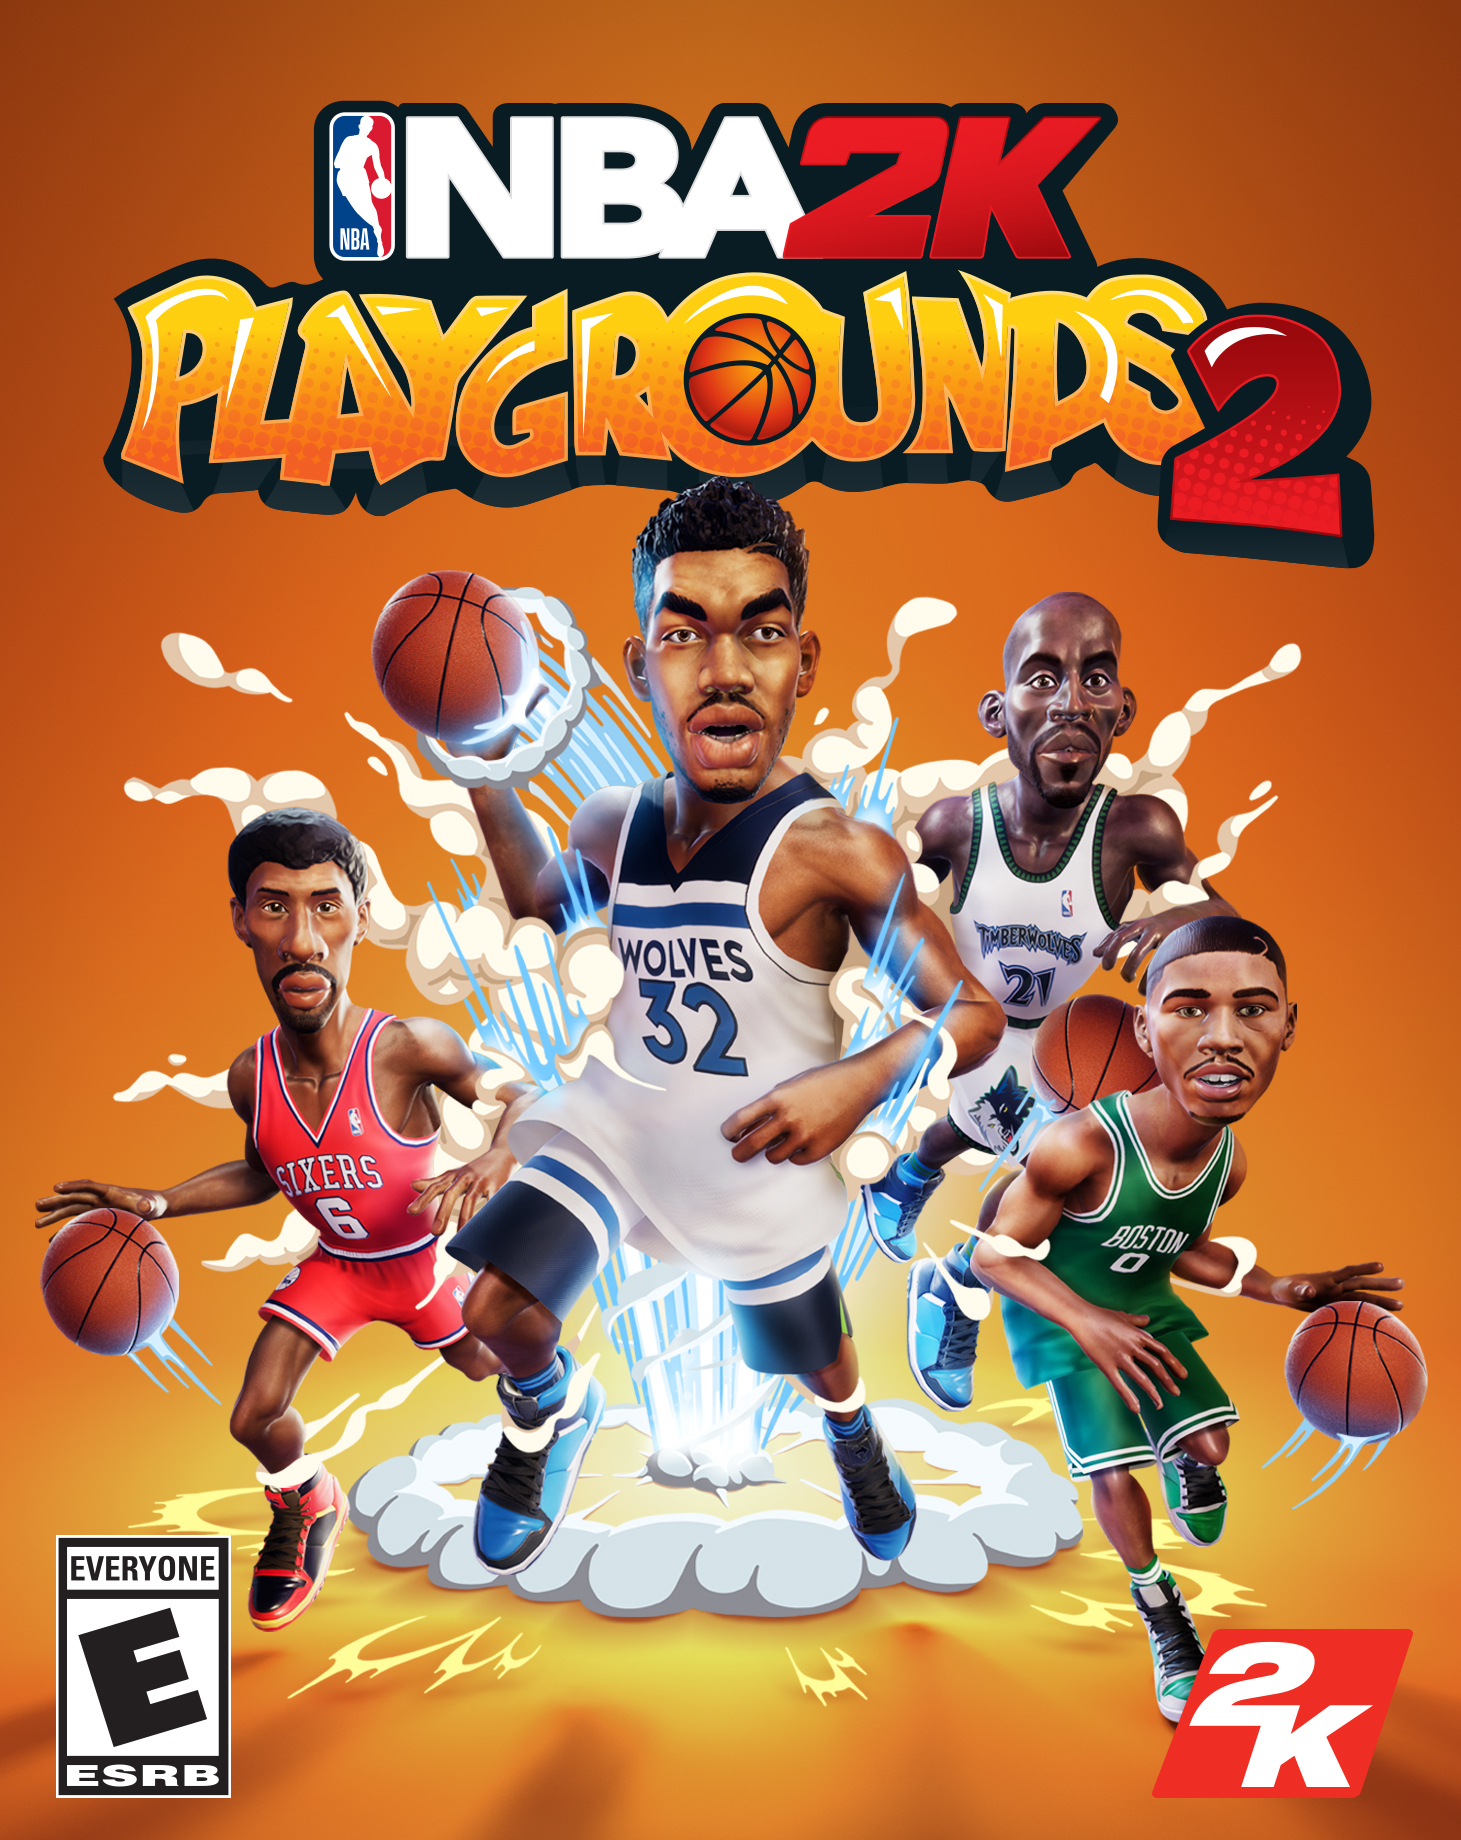 Nexway NBA 2K Playgrounds 2 vídeo juego PC Básico Español